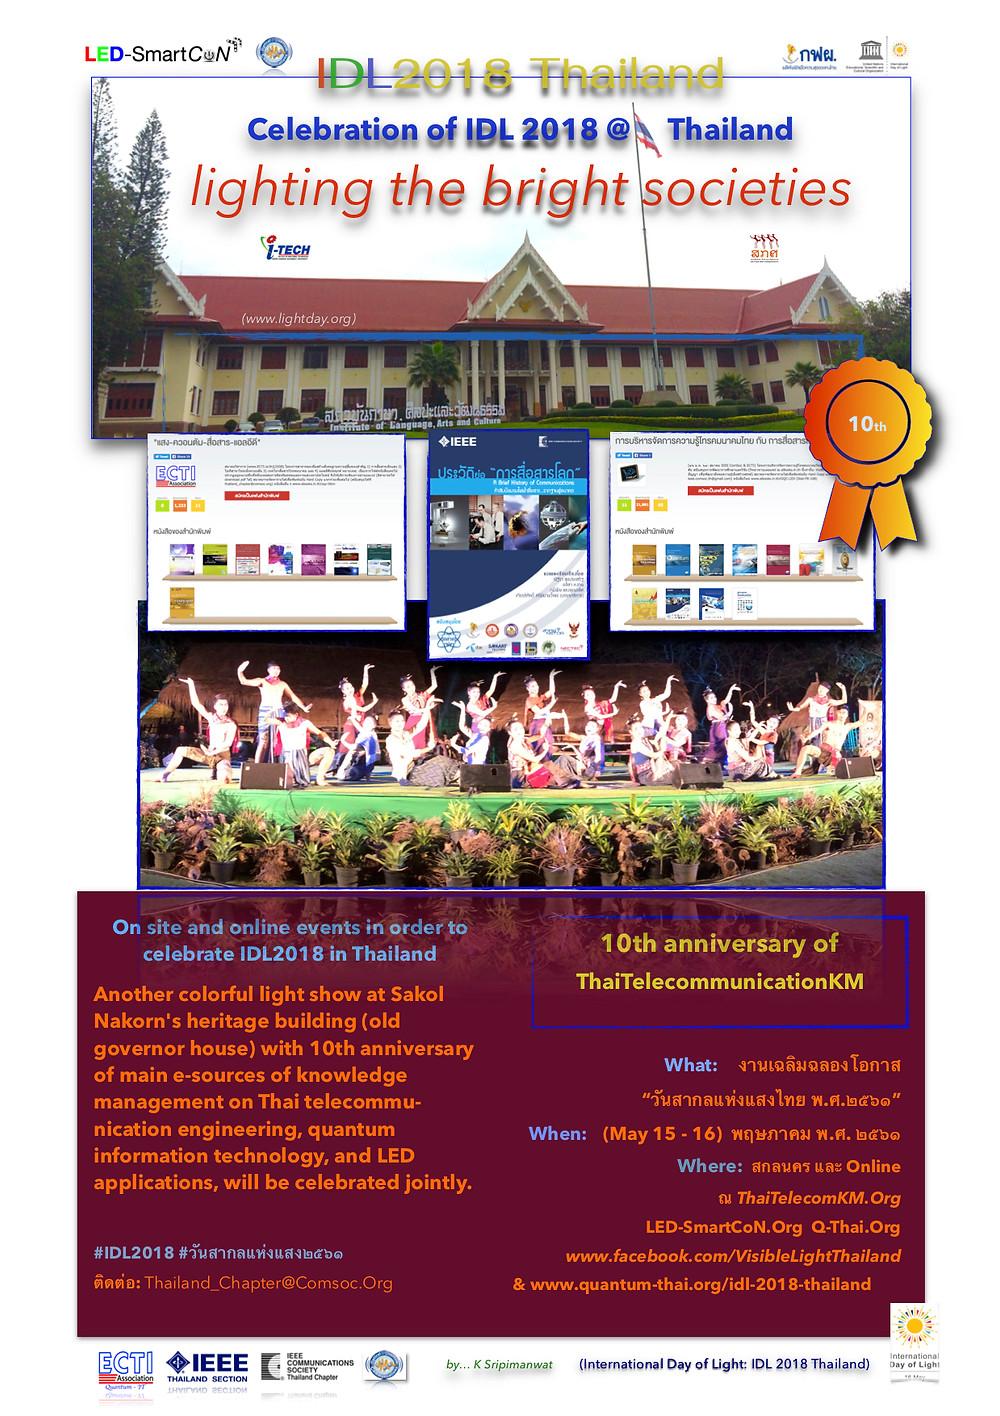 "What: งานเฉลิมฉลองโอกาส ""วันสากลแห่งแสงไทย พ.ศ.๒๕๖๑""    When: (May 15 - 16)  พฤษภาคม พ.ศ. ๒๕๖๑   Where: สกลนคร และ Online ณ  ThaiTelecomKM.Org  LED-SmartCoN.Org  Q-Thai.Org  www.facebook.com/VisibleLightThailand  & www.quantum-thai.org/idl-2018-thailand"